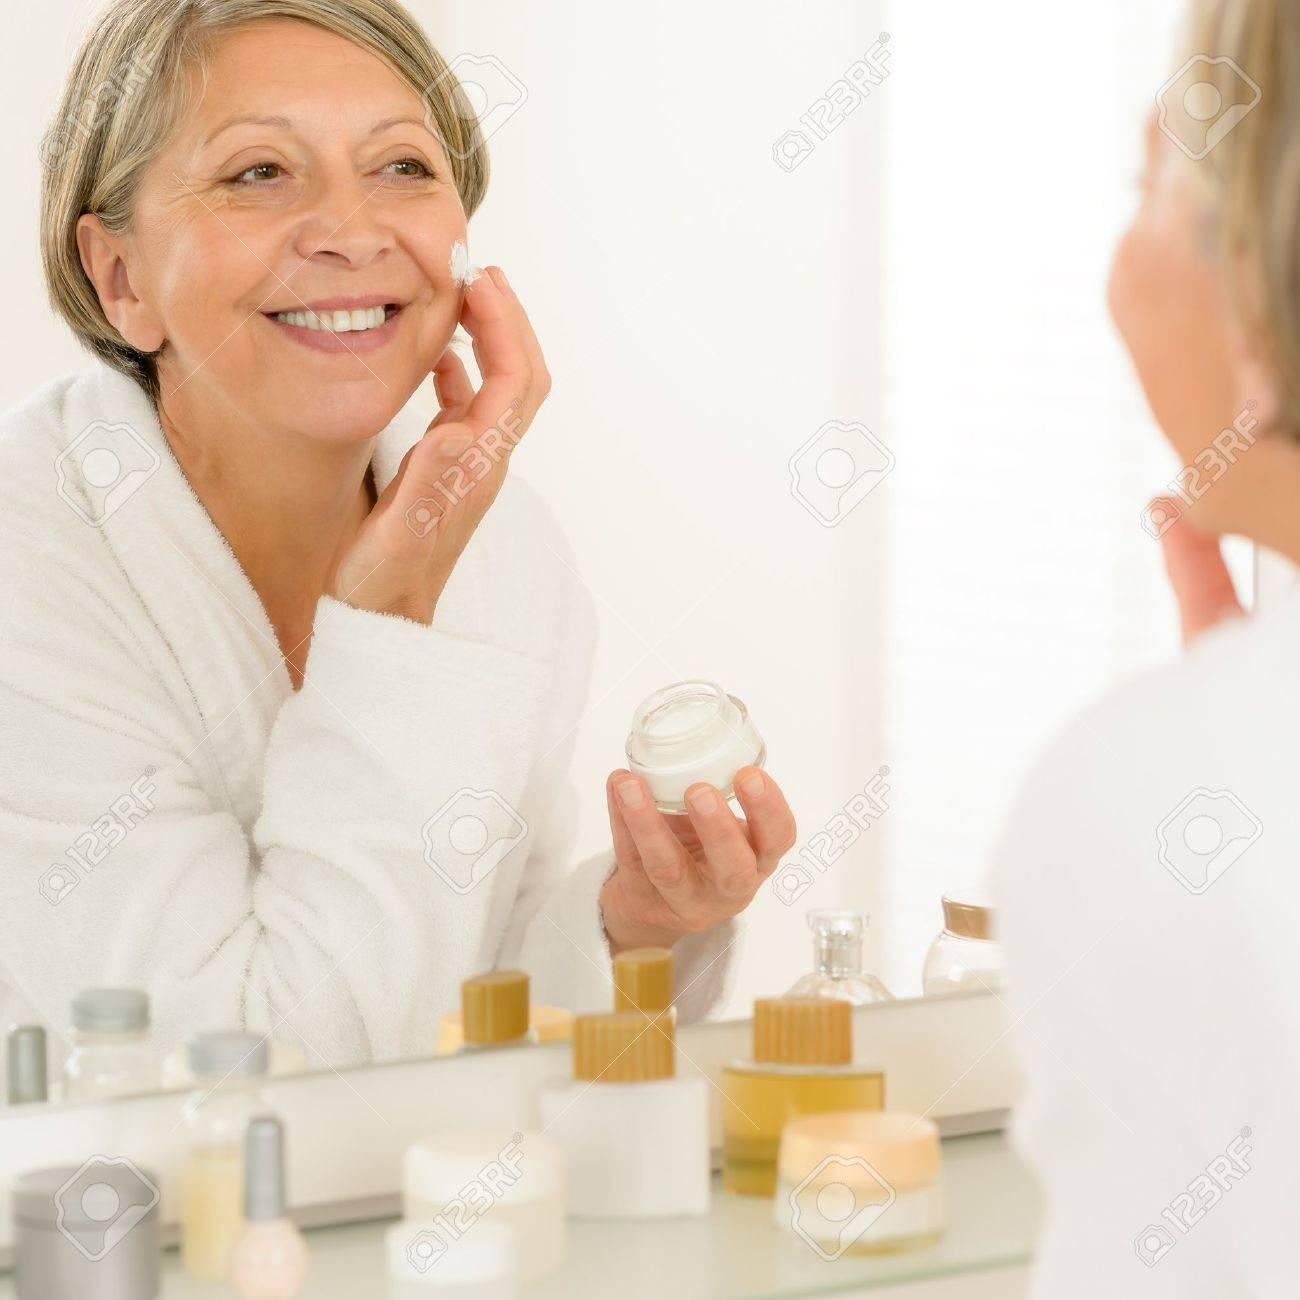 Smiling senior woman apply anti-wrinkles cream looking in bathroom mirror Stock Photo - 14605257